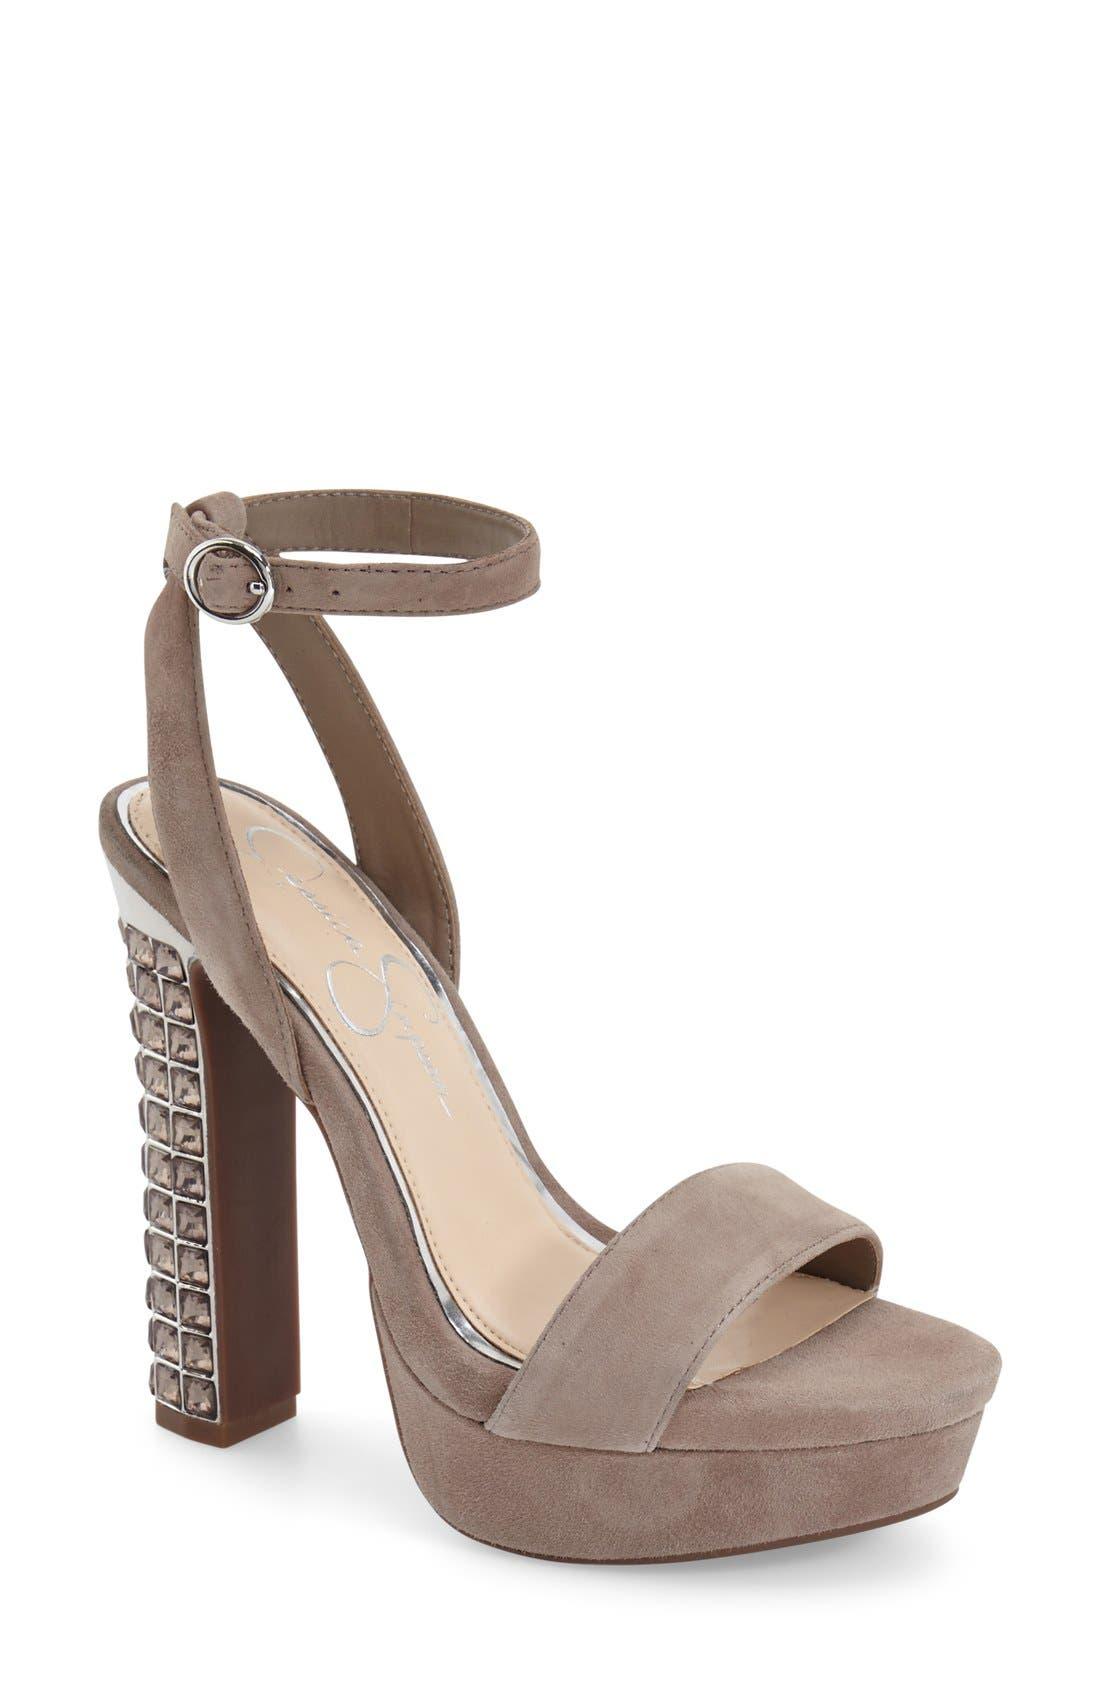 Alternate Image 1 Selected - Jessica Simpson 'Banda' Embellished Platform Sandal (Women)